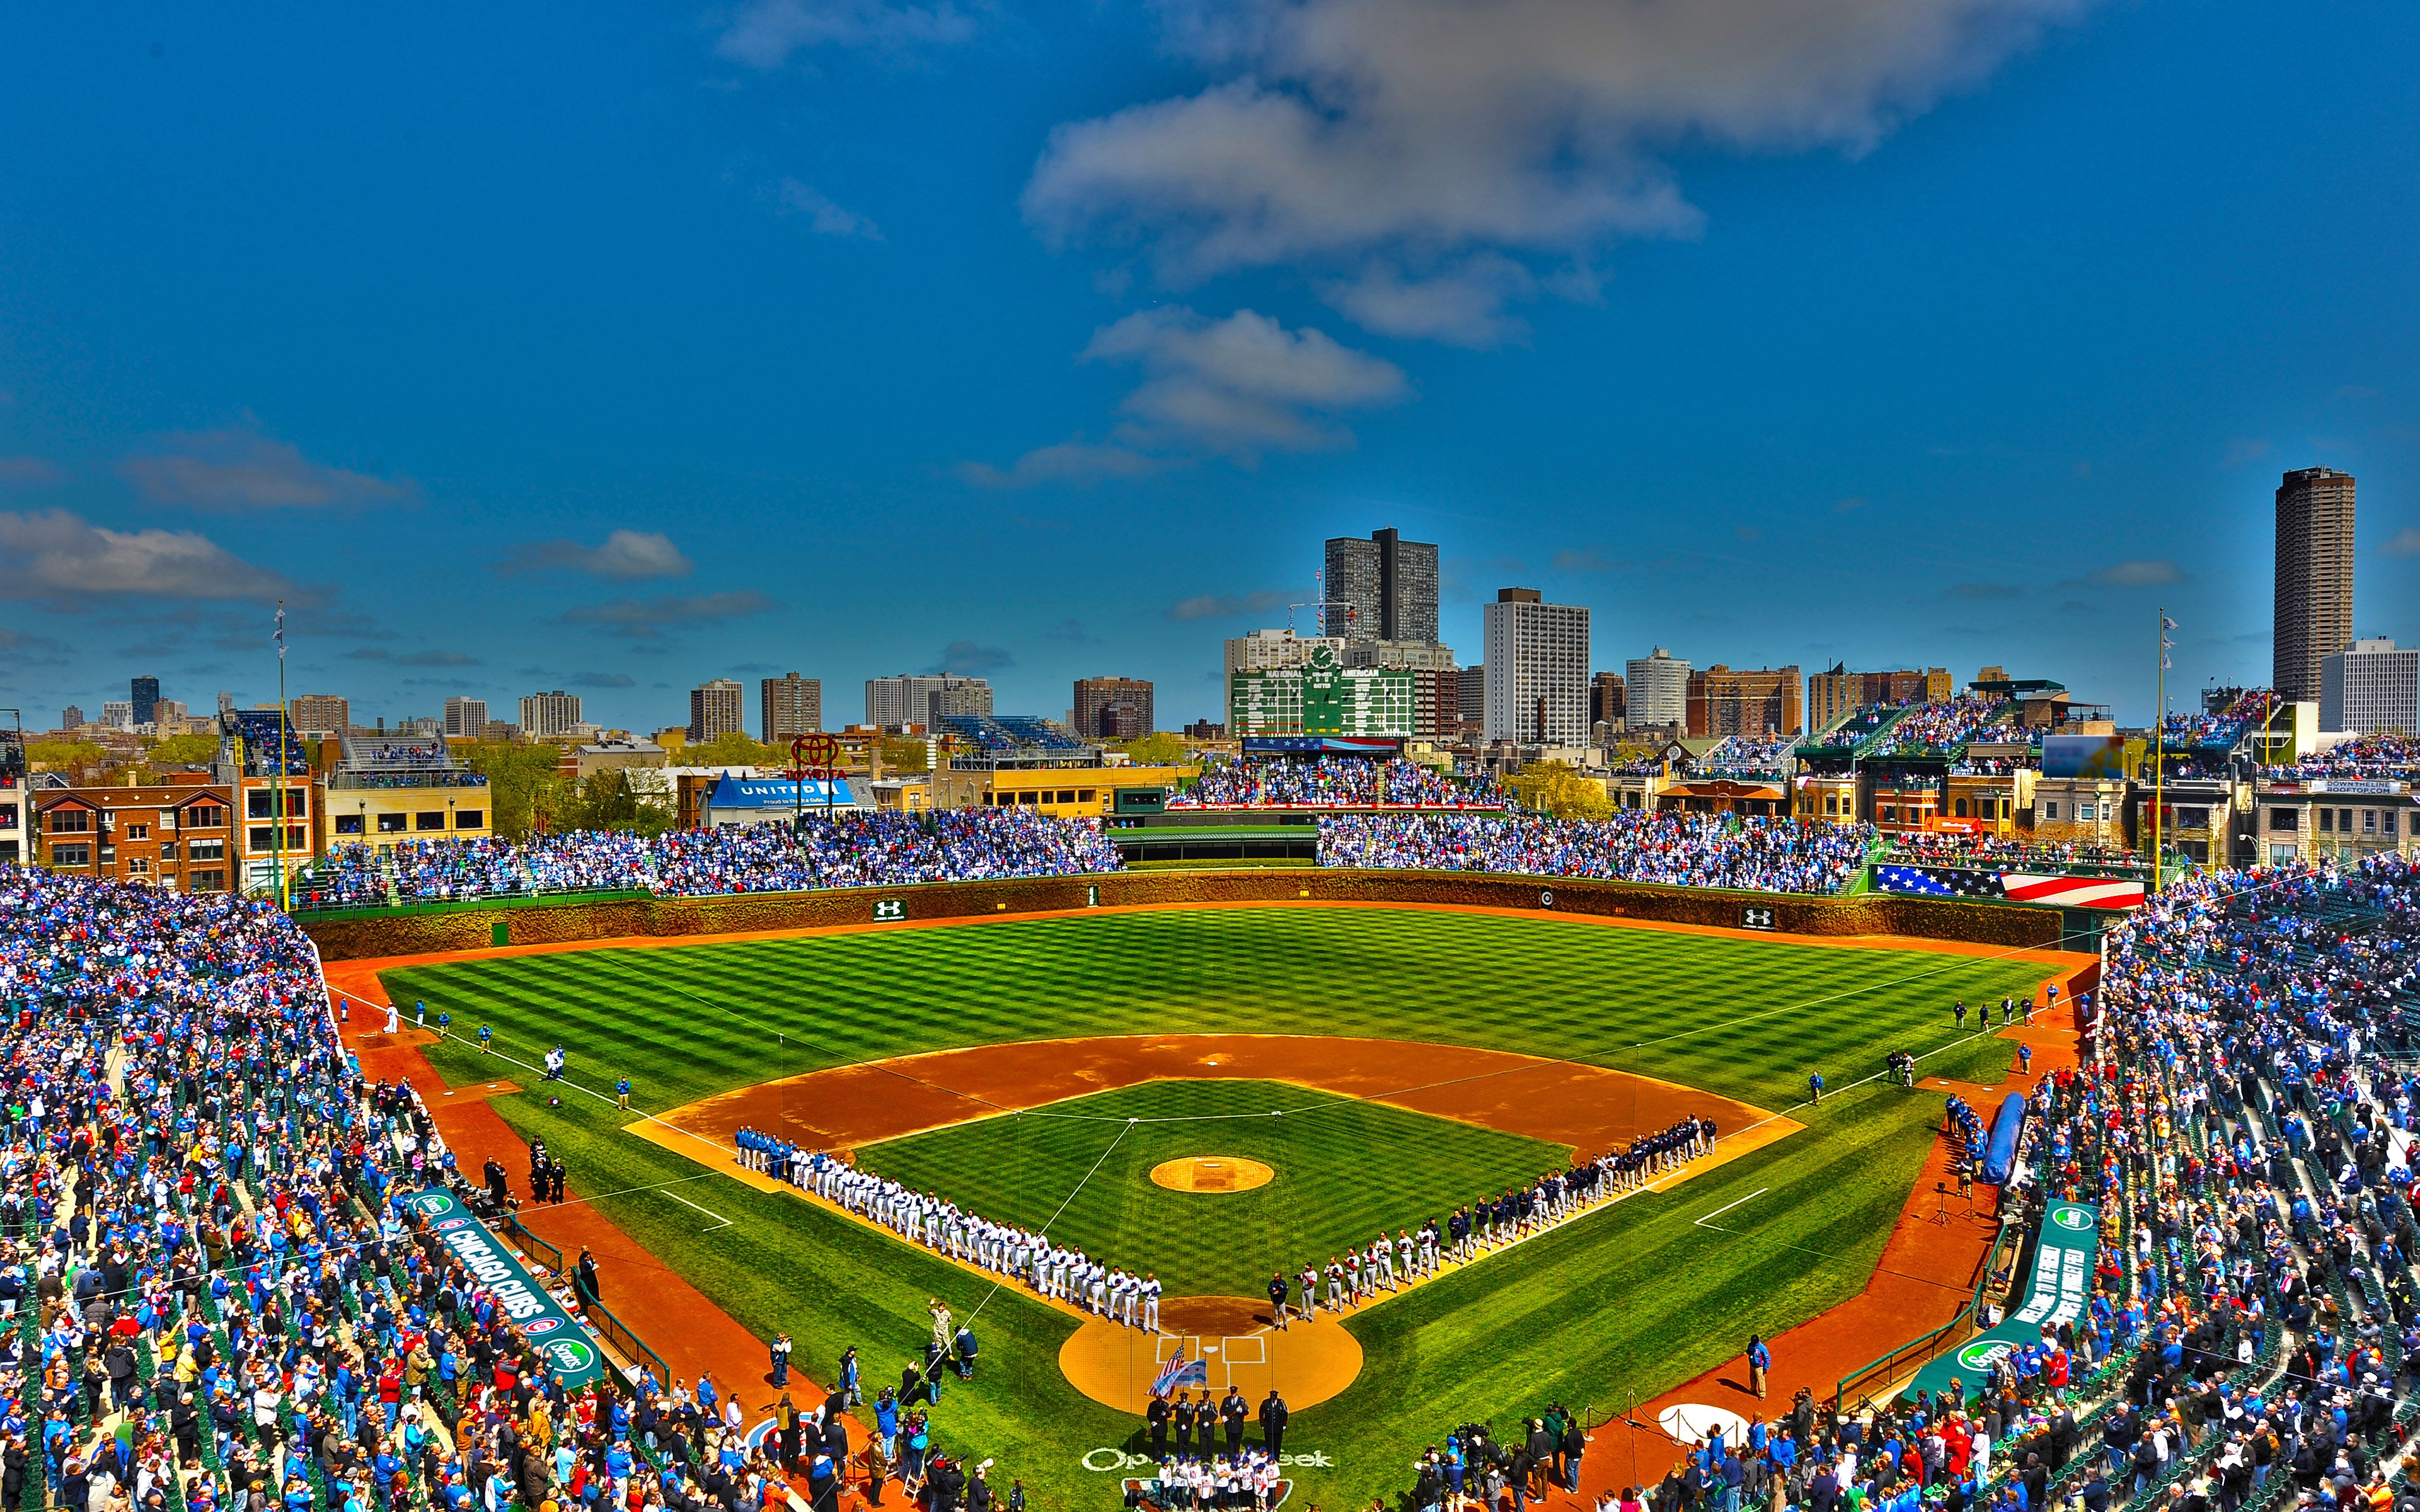 Chicago cubs ballpark wrigley field chicago illinois wallpaperg chicago cubs ballpark wrigley field chicago illinois wallpaper amipublicfo Gallery